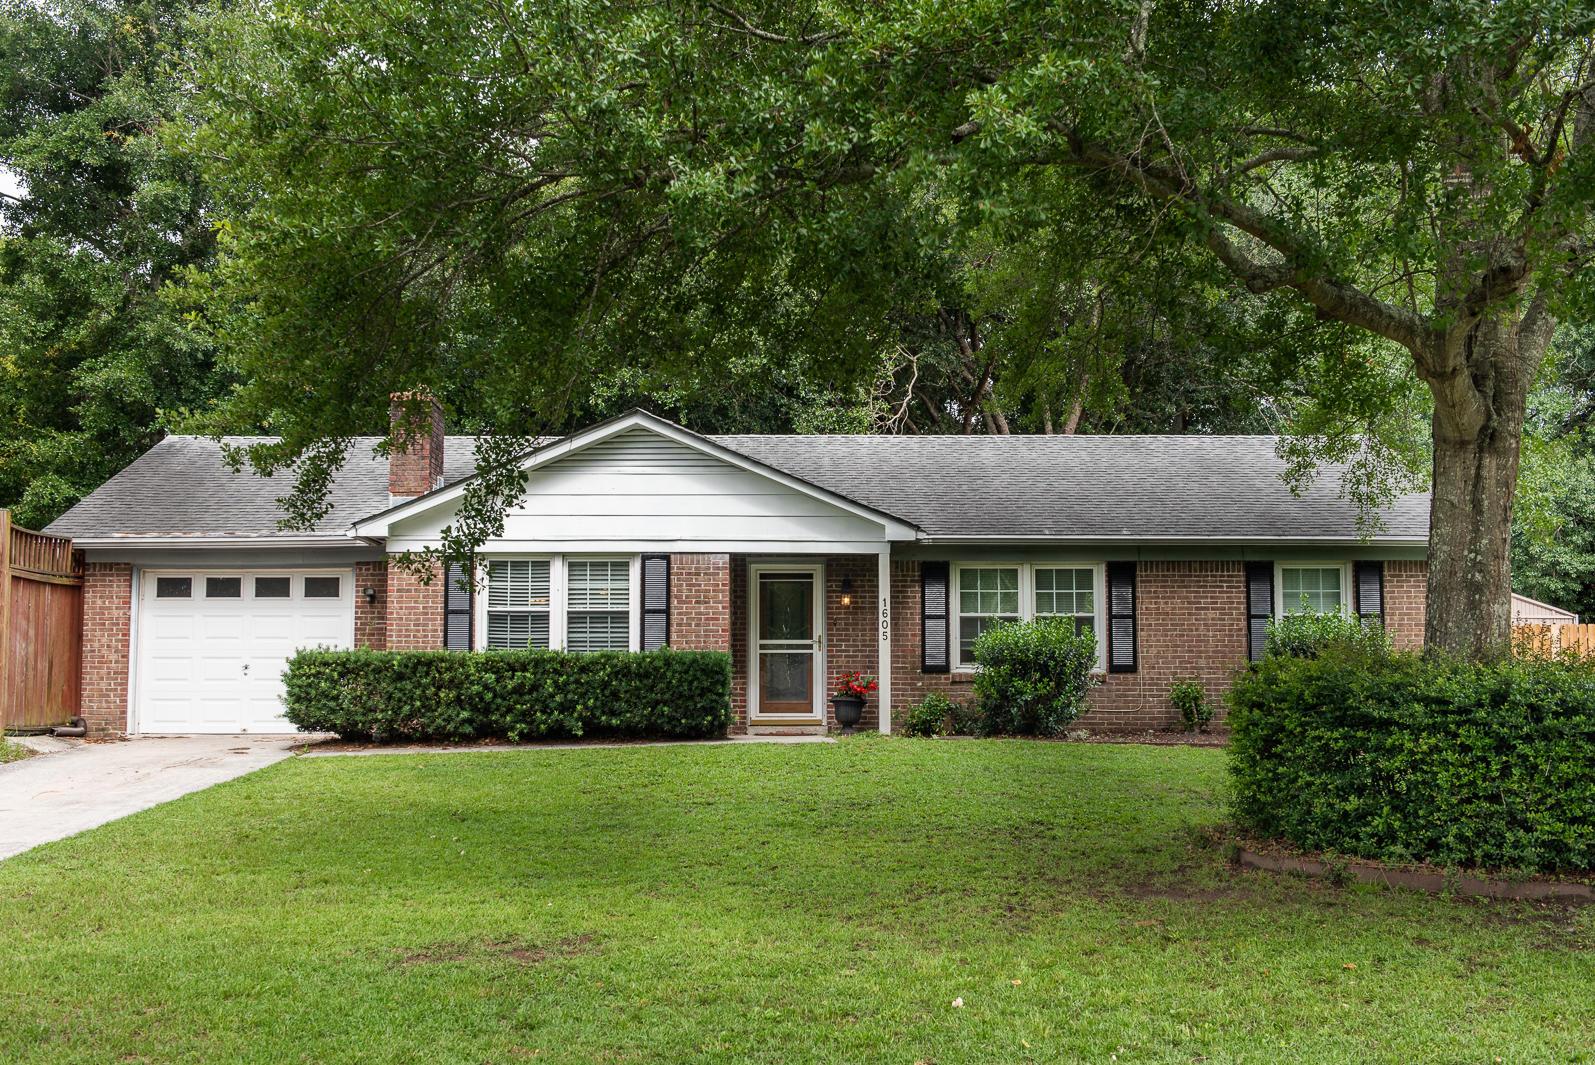 Wando East Homes For Sale - 1605 Babington, Mount Pleasant, SC - 37